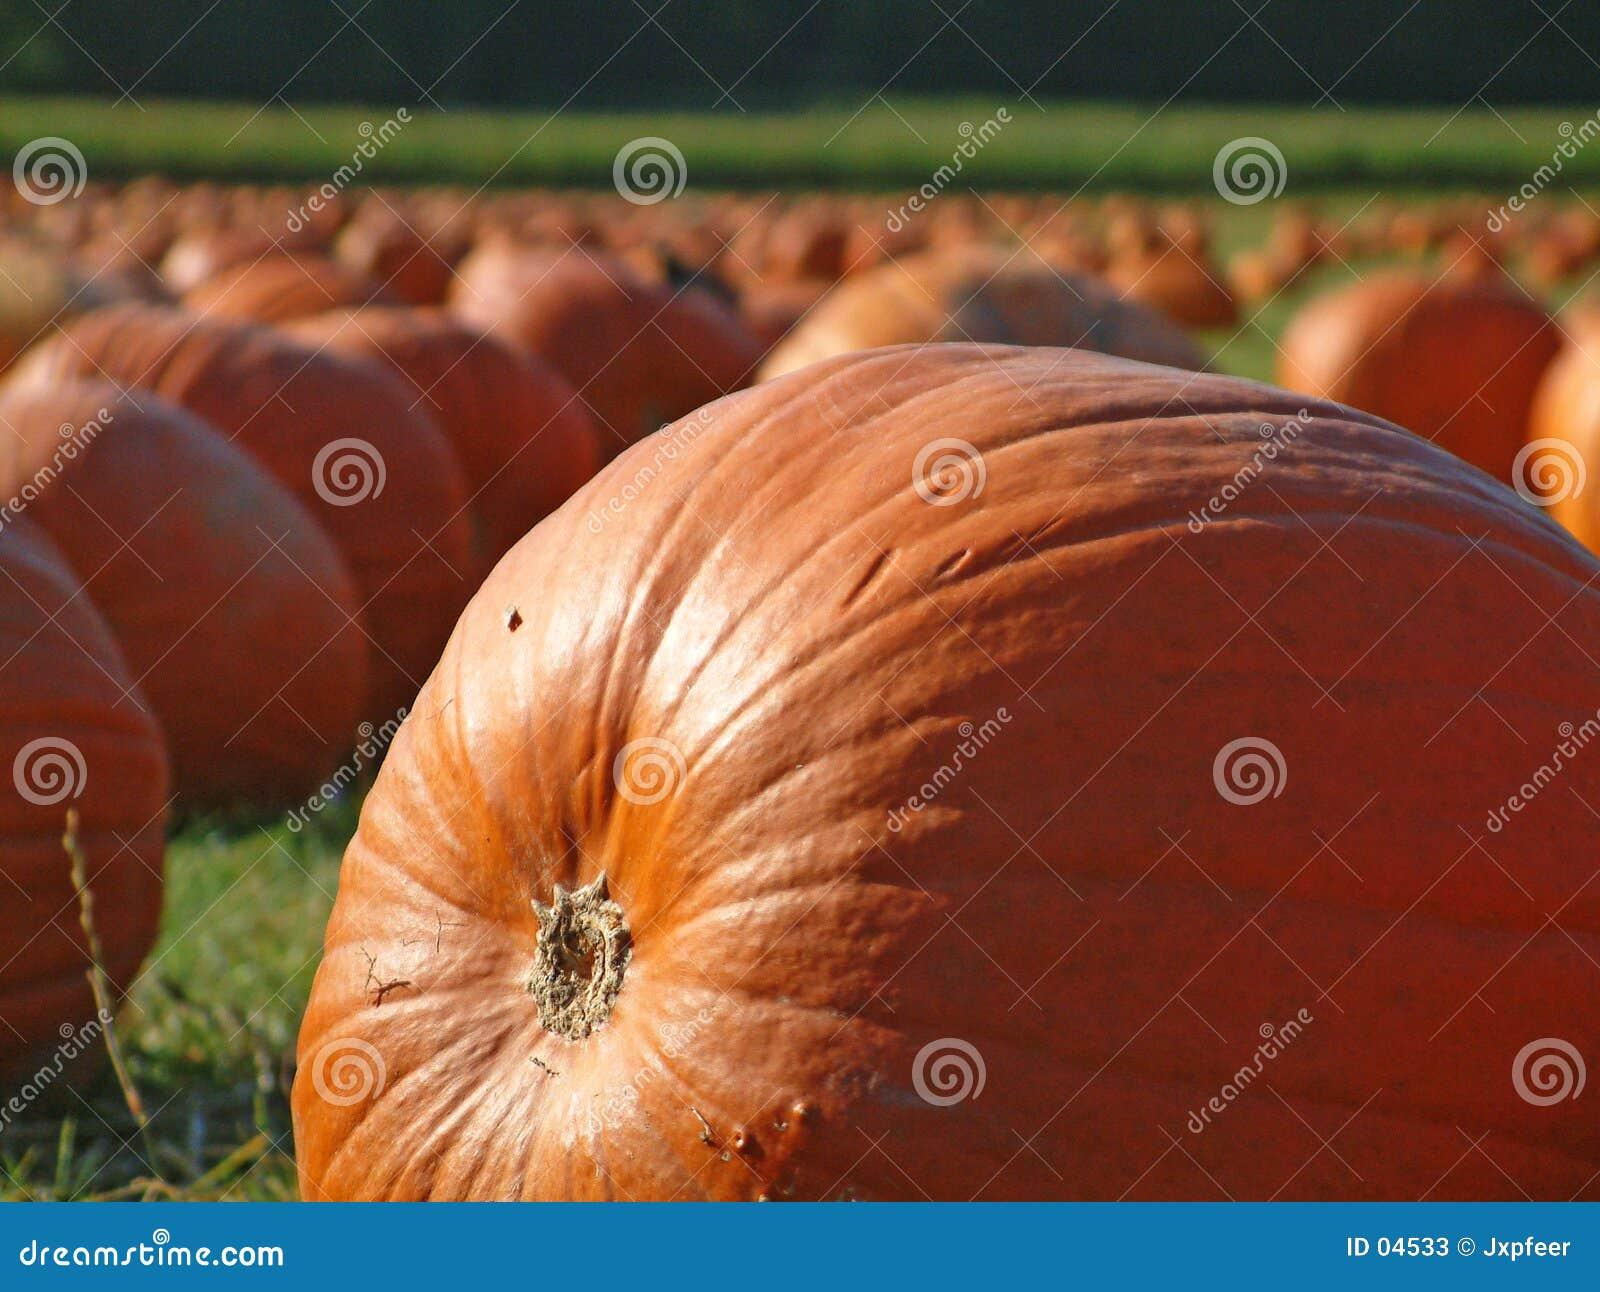 Pumpkin field 5